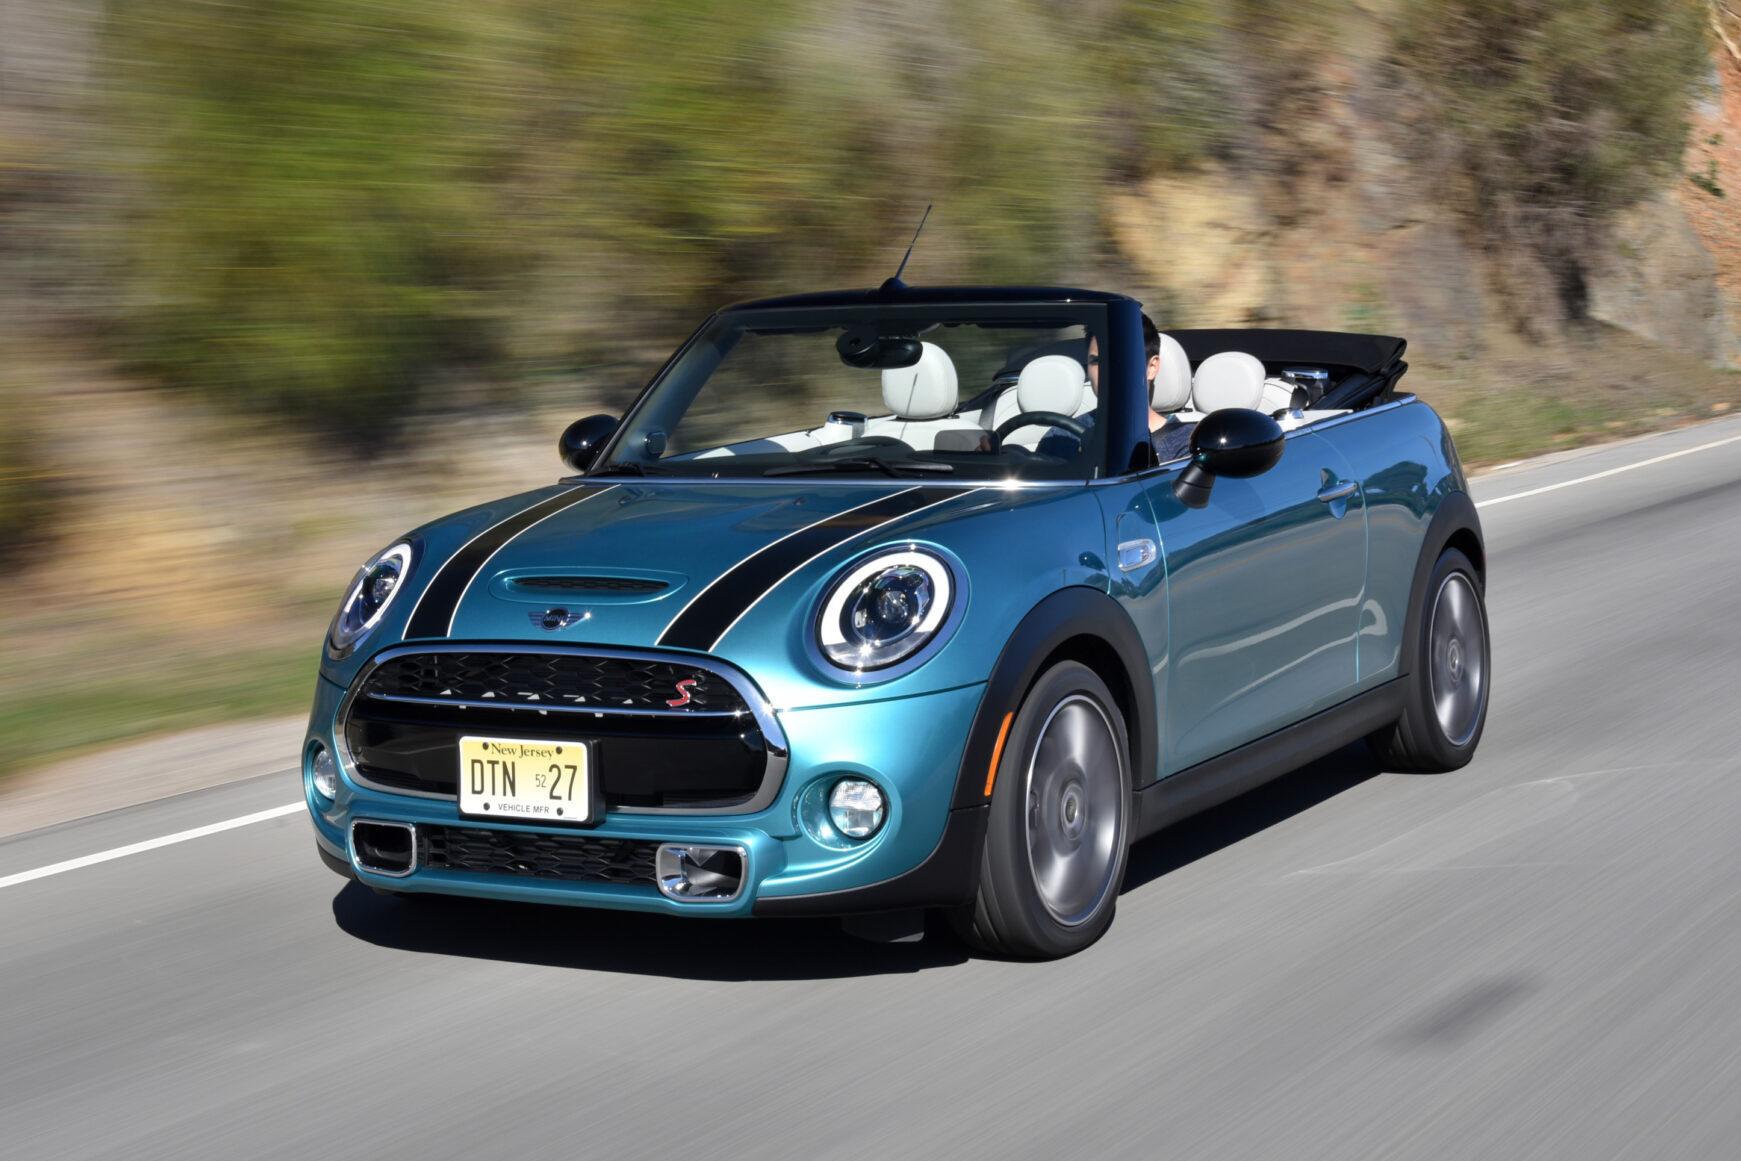 2021 Mini Cooper Convertible driving top down (front 3/4 view) - Caribbean Aqua  BEST Road-Trip Cars of 2020